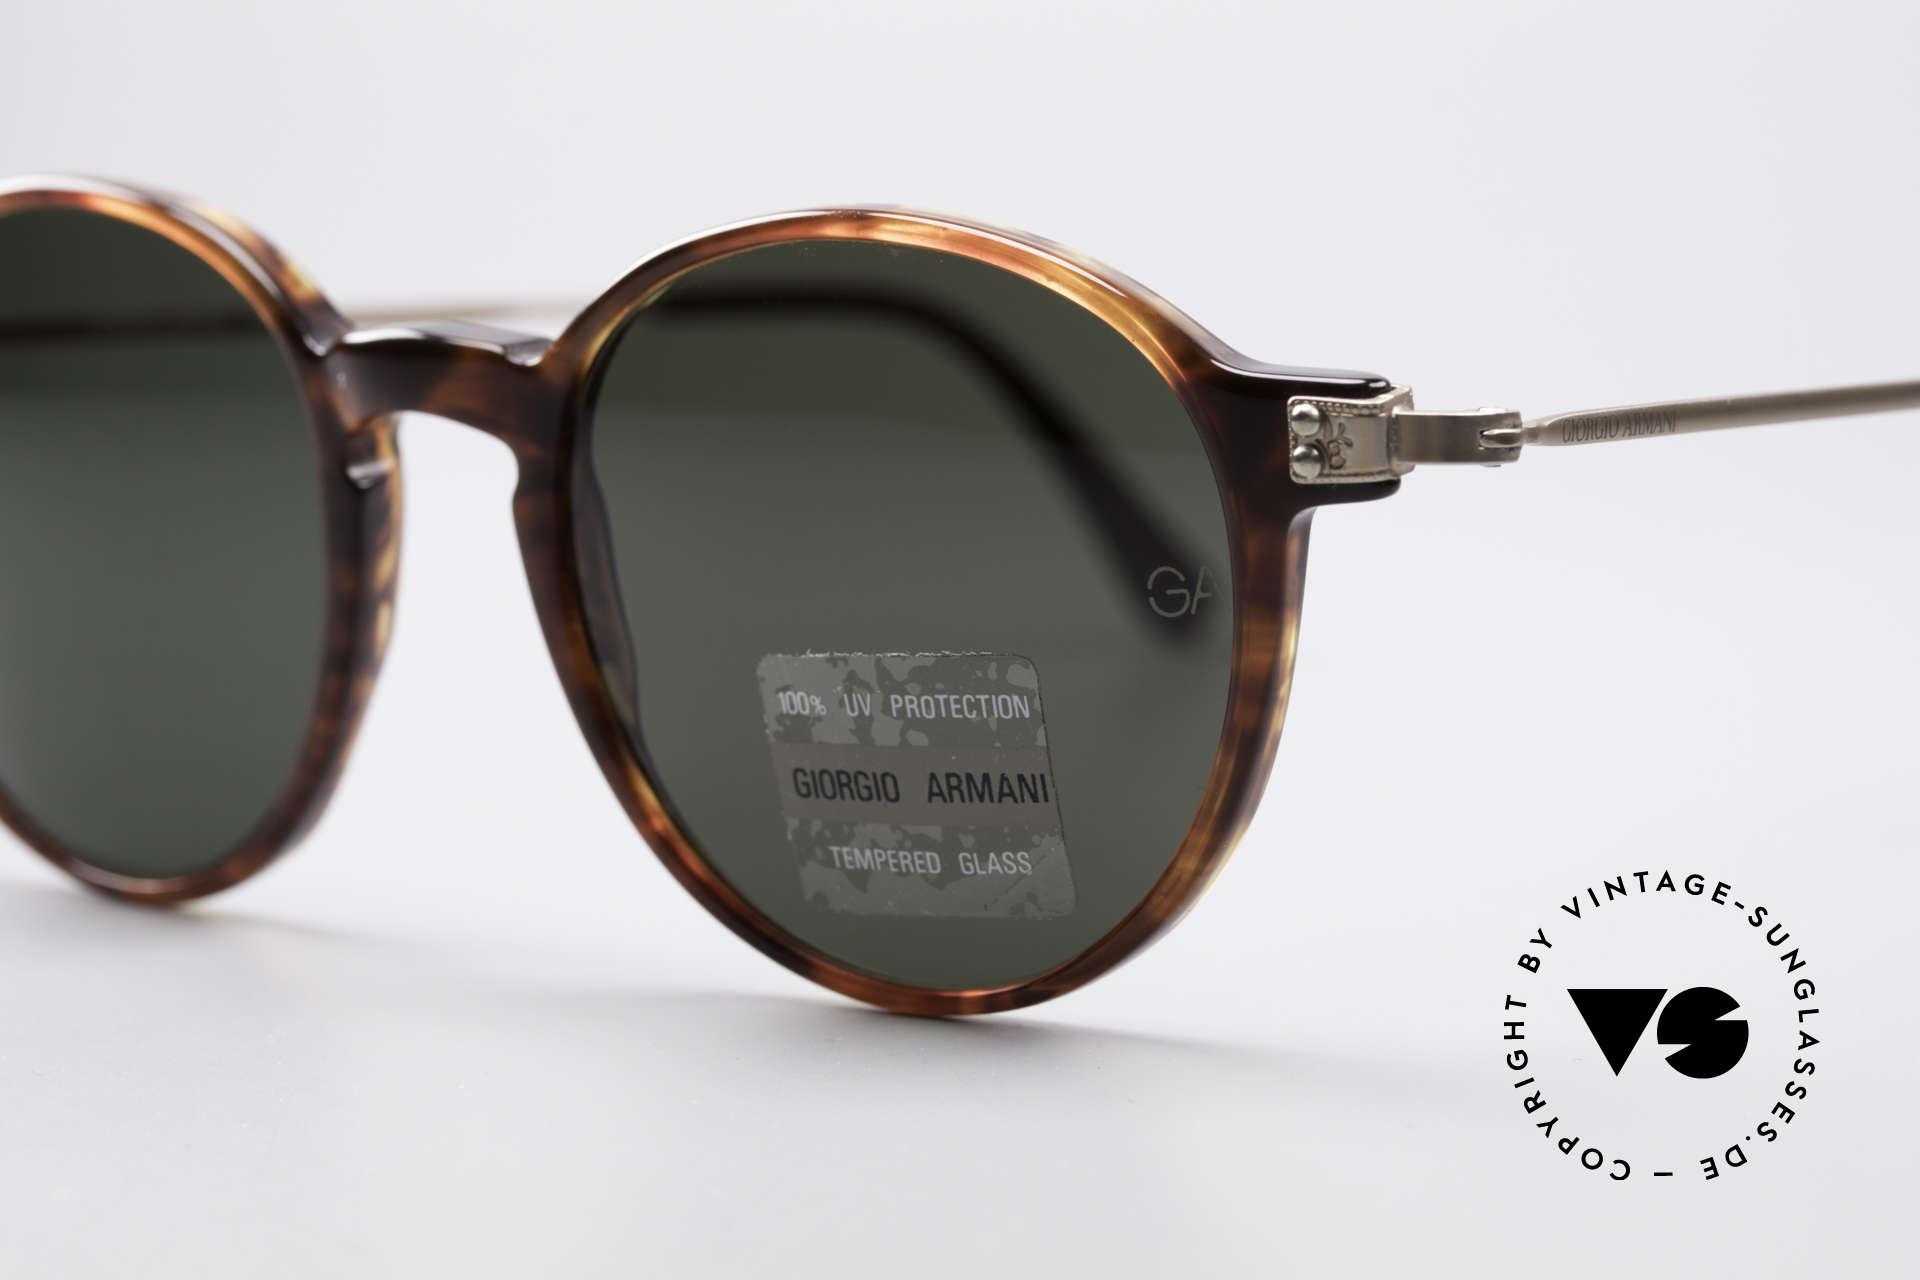 Giorgio Armani 358 Vintage Panto Sunglasses, a brilliant combination of quality, design and comfort, Made for Men